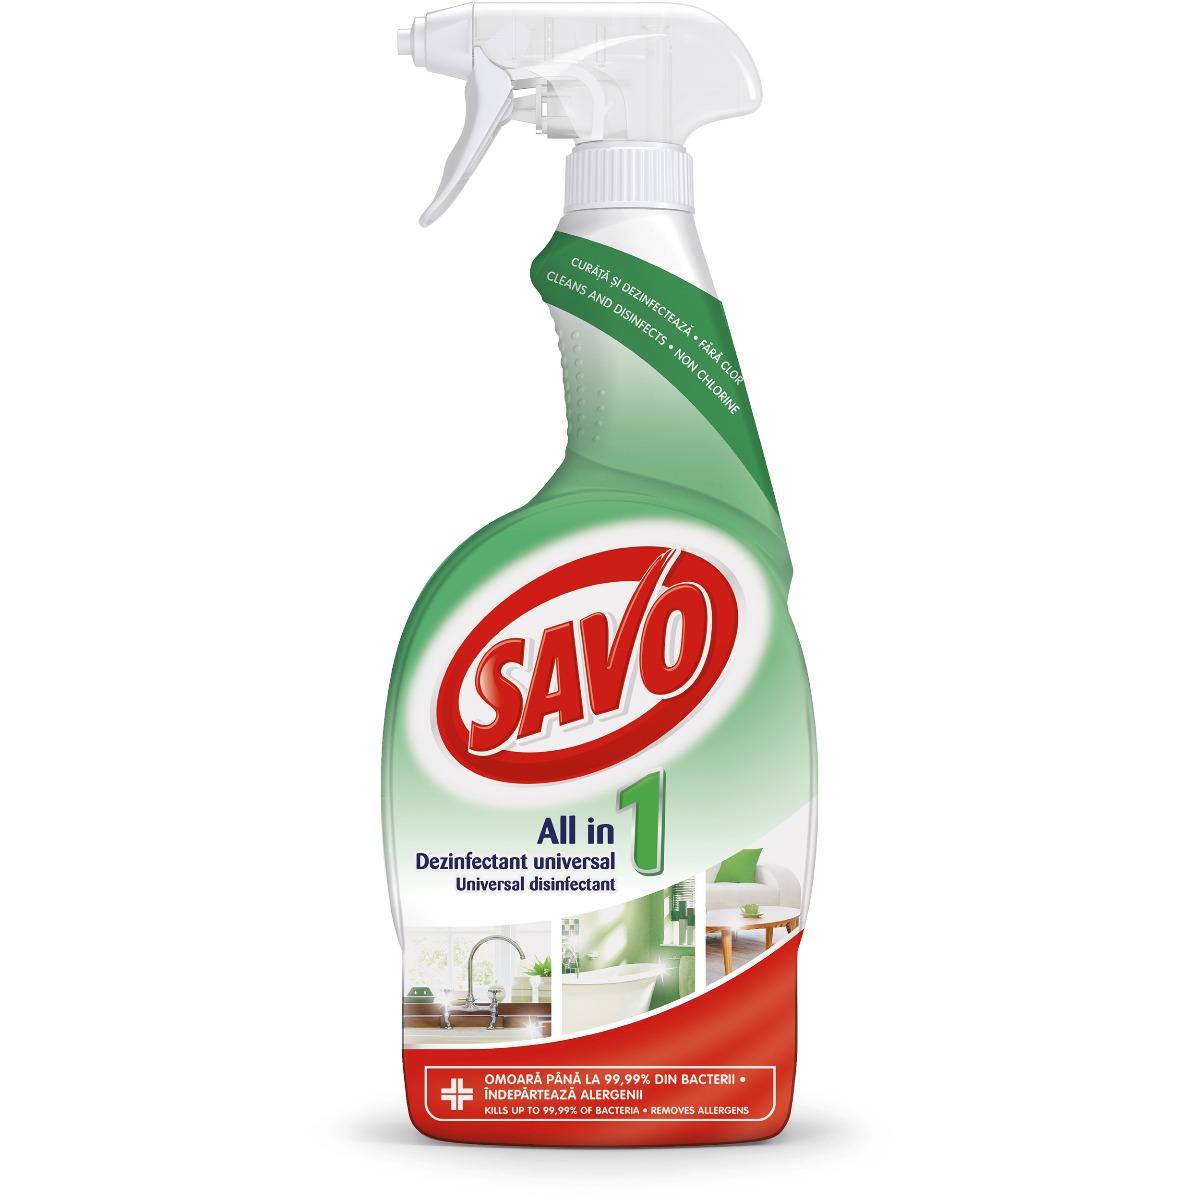 Spray dezinfectant fara clor universal Savo, 650 ml imagine